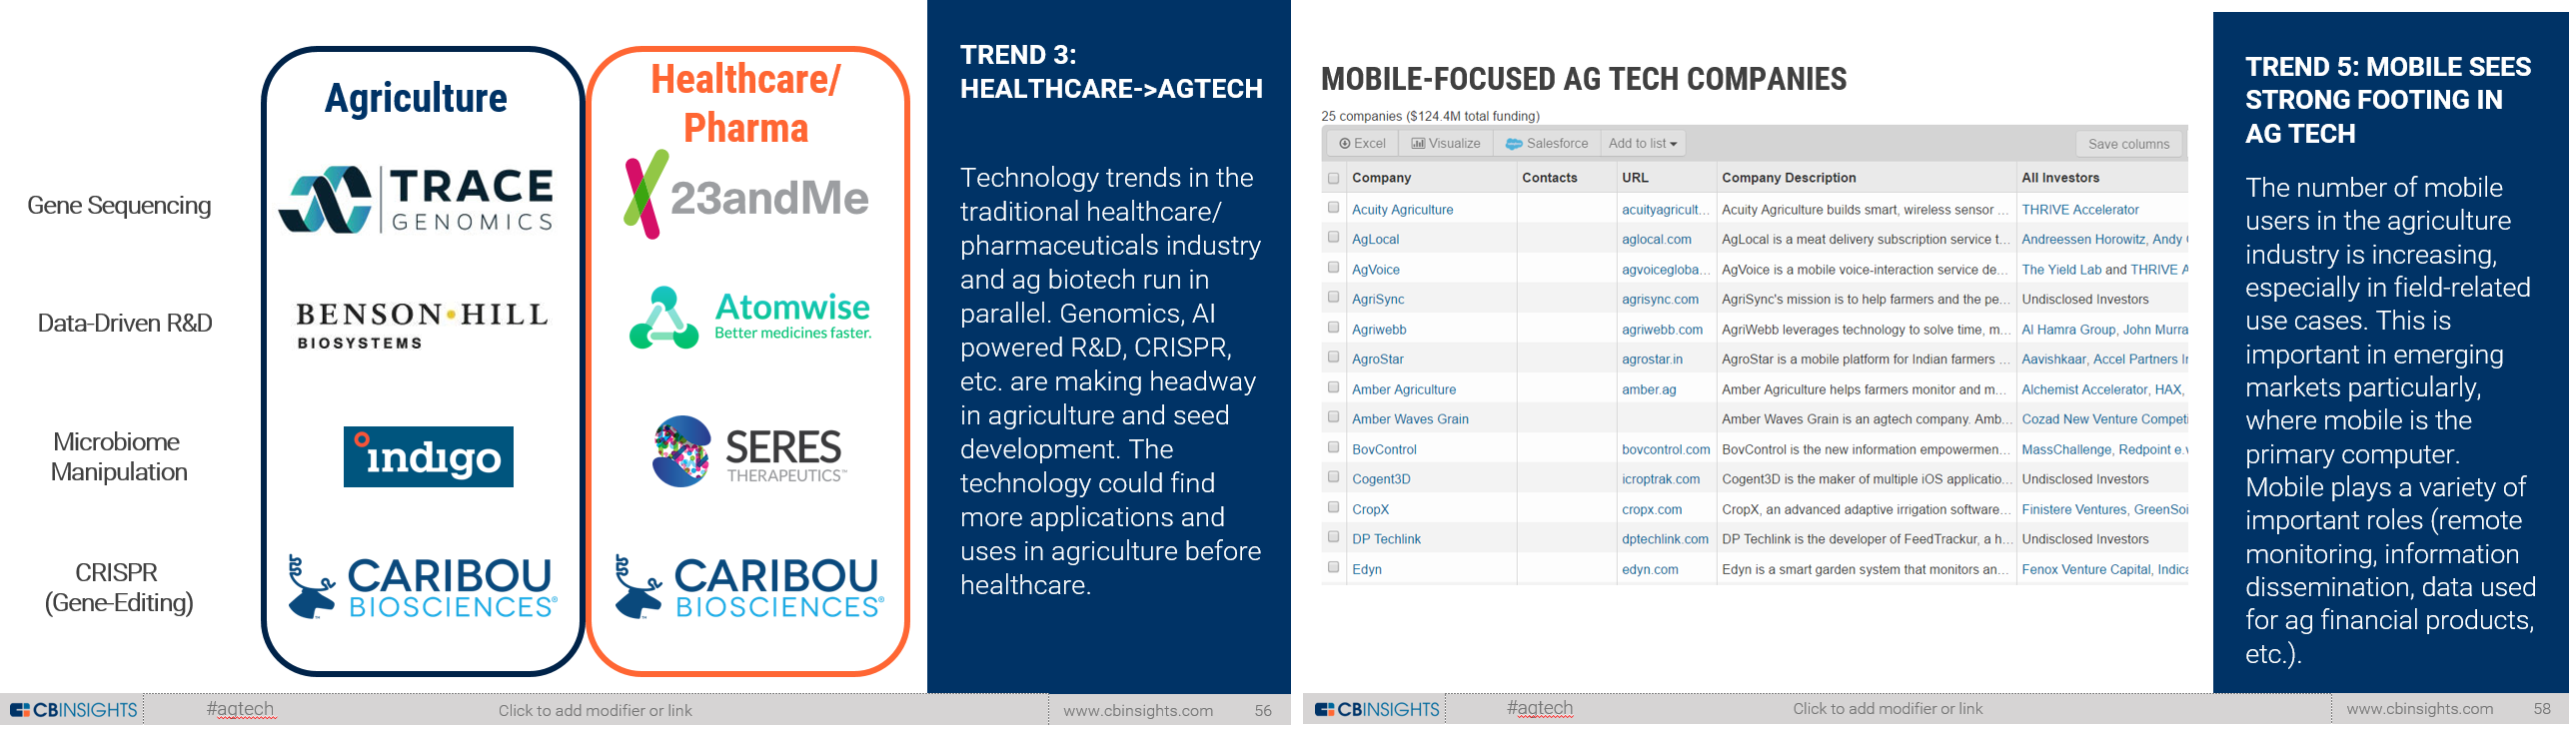 ag tech trends webinar